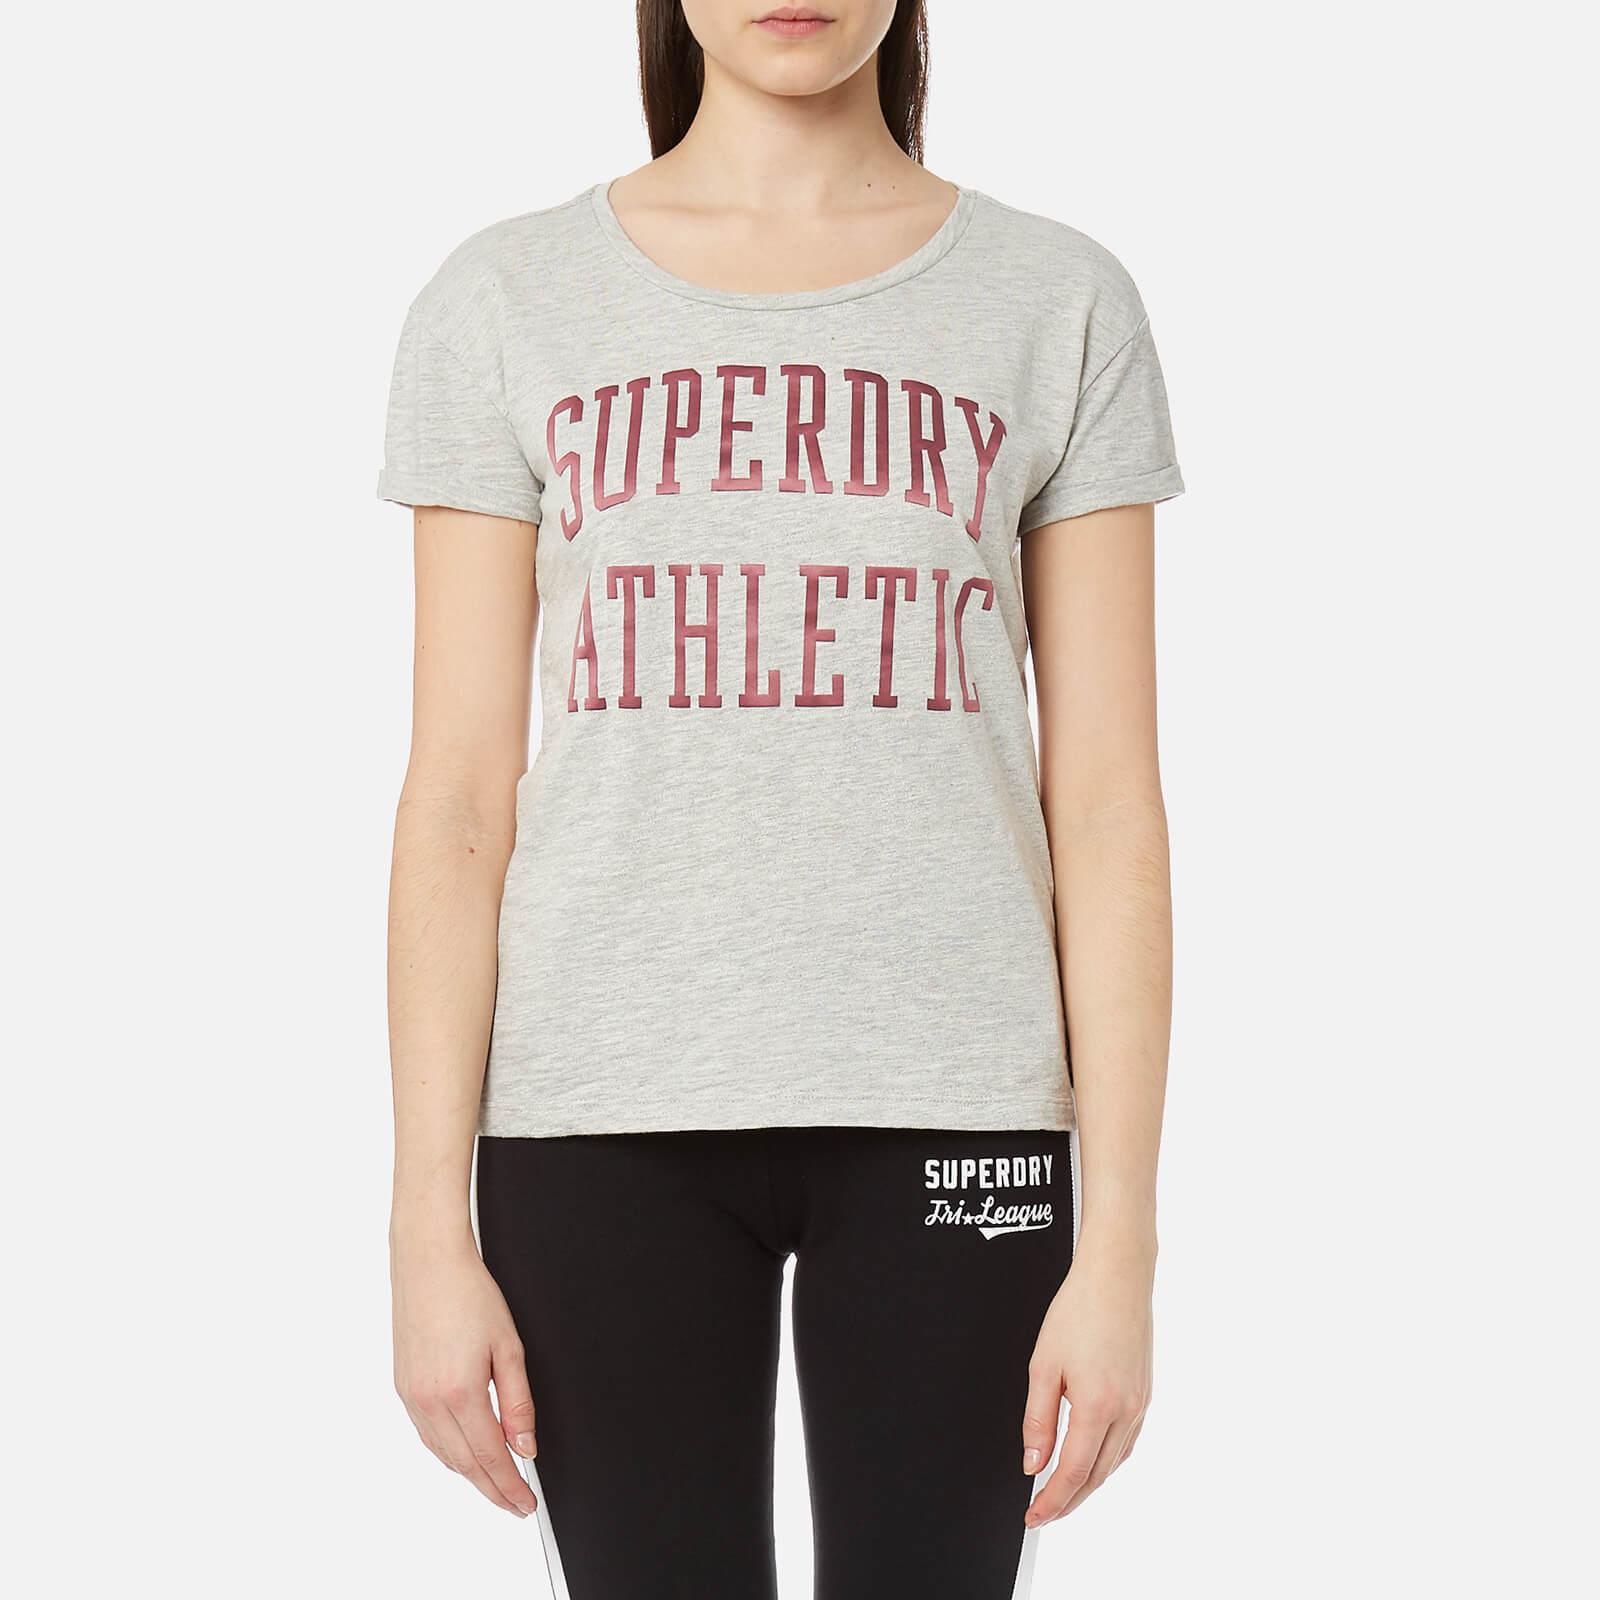 Superdry Women's Athletic Slim Boyfriend T-Shirt - Jock Grey Marl - S - Grey